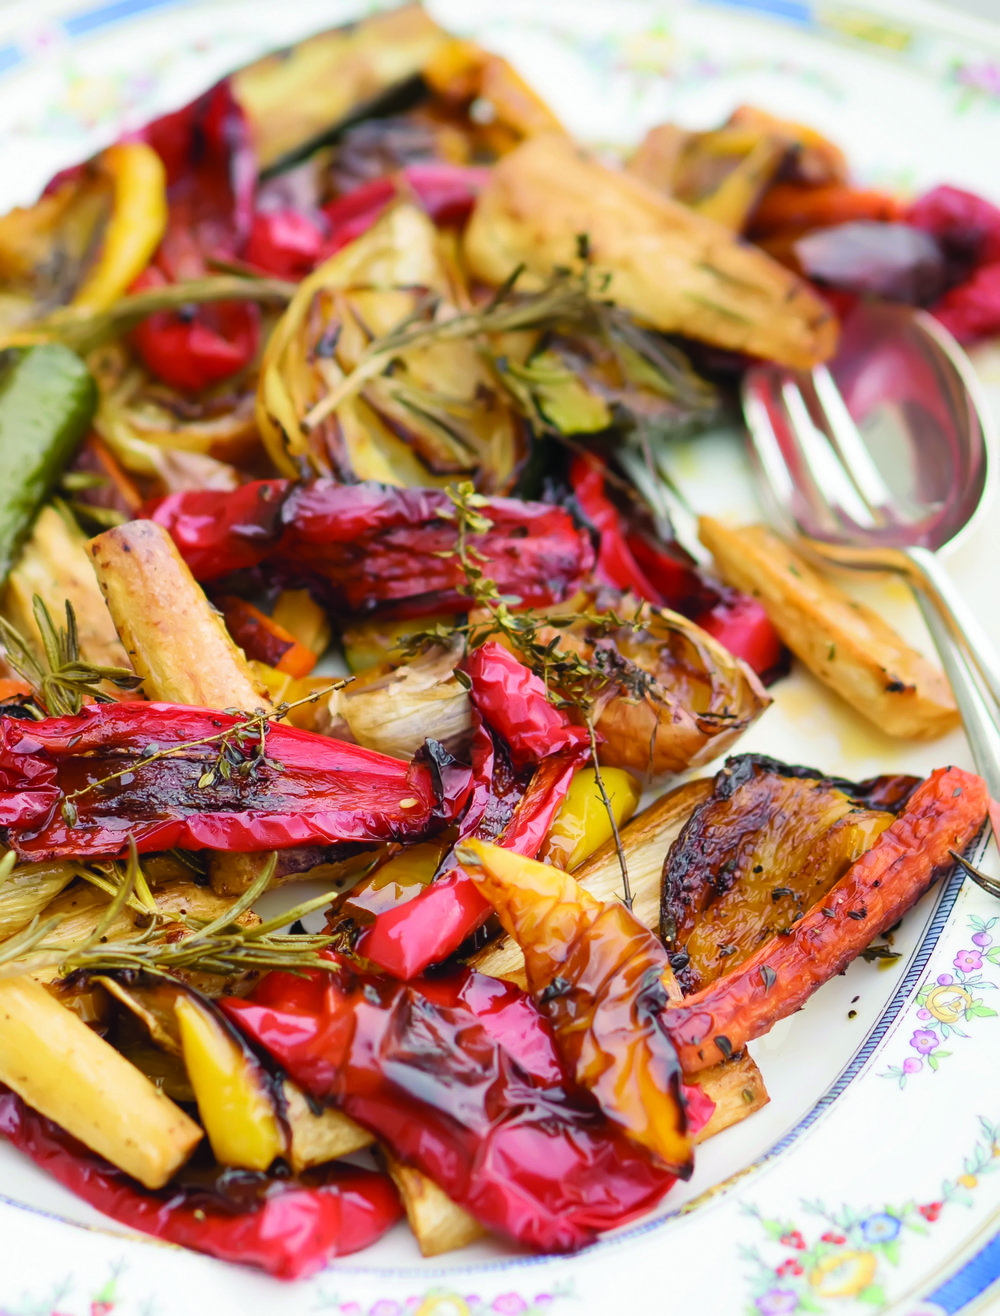 Caramelised tray roast veg 916 final book crop for folder.jpg